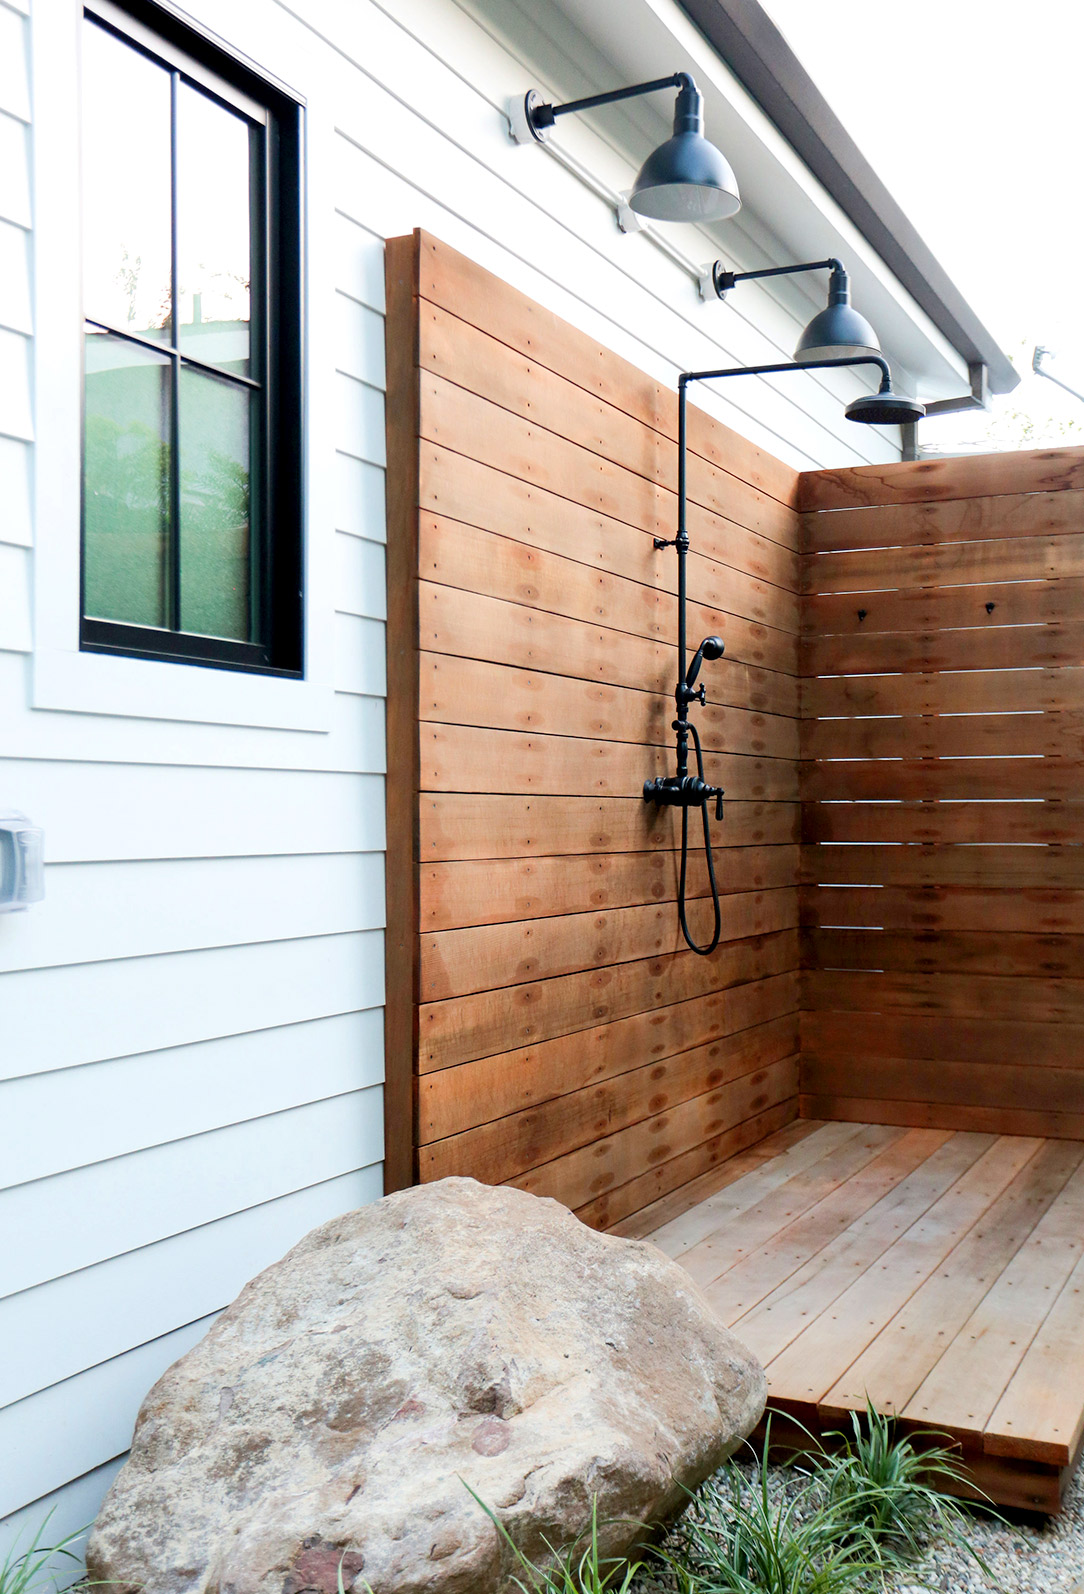 Luxury Outdoor Showers To Update Your Backyard 05 Luxury outdoor showers Luxury Outdoor Showers To Update Your Backyard Luxury Outdoor Showers To Update Your Backyard 05